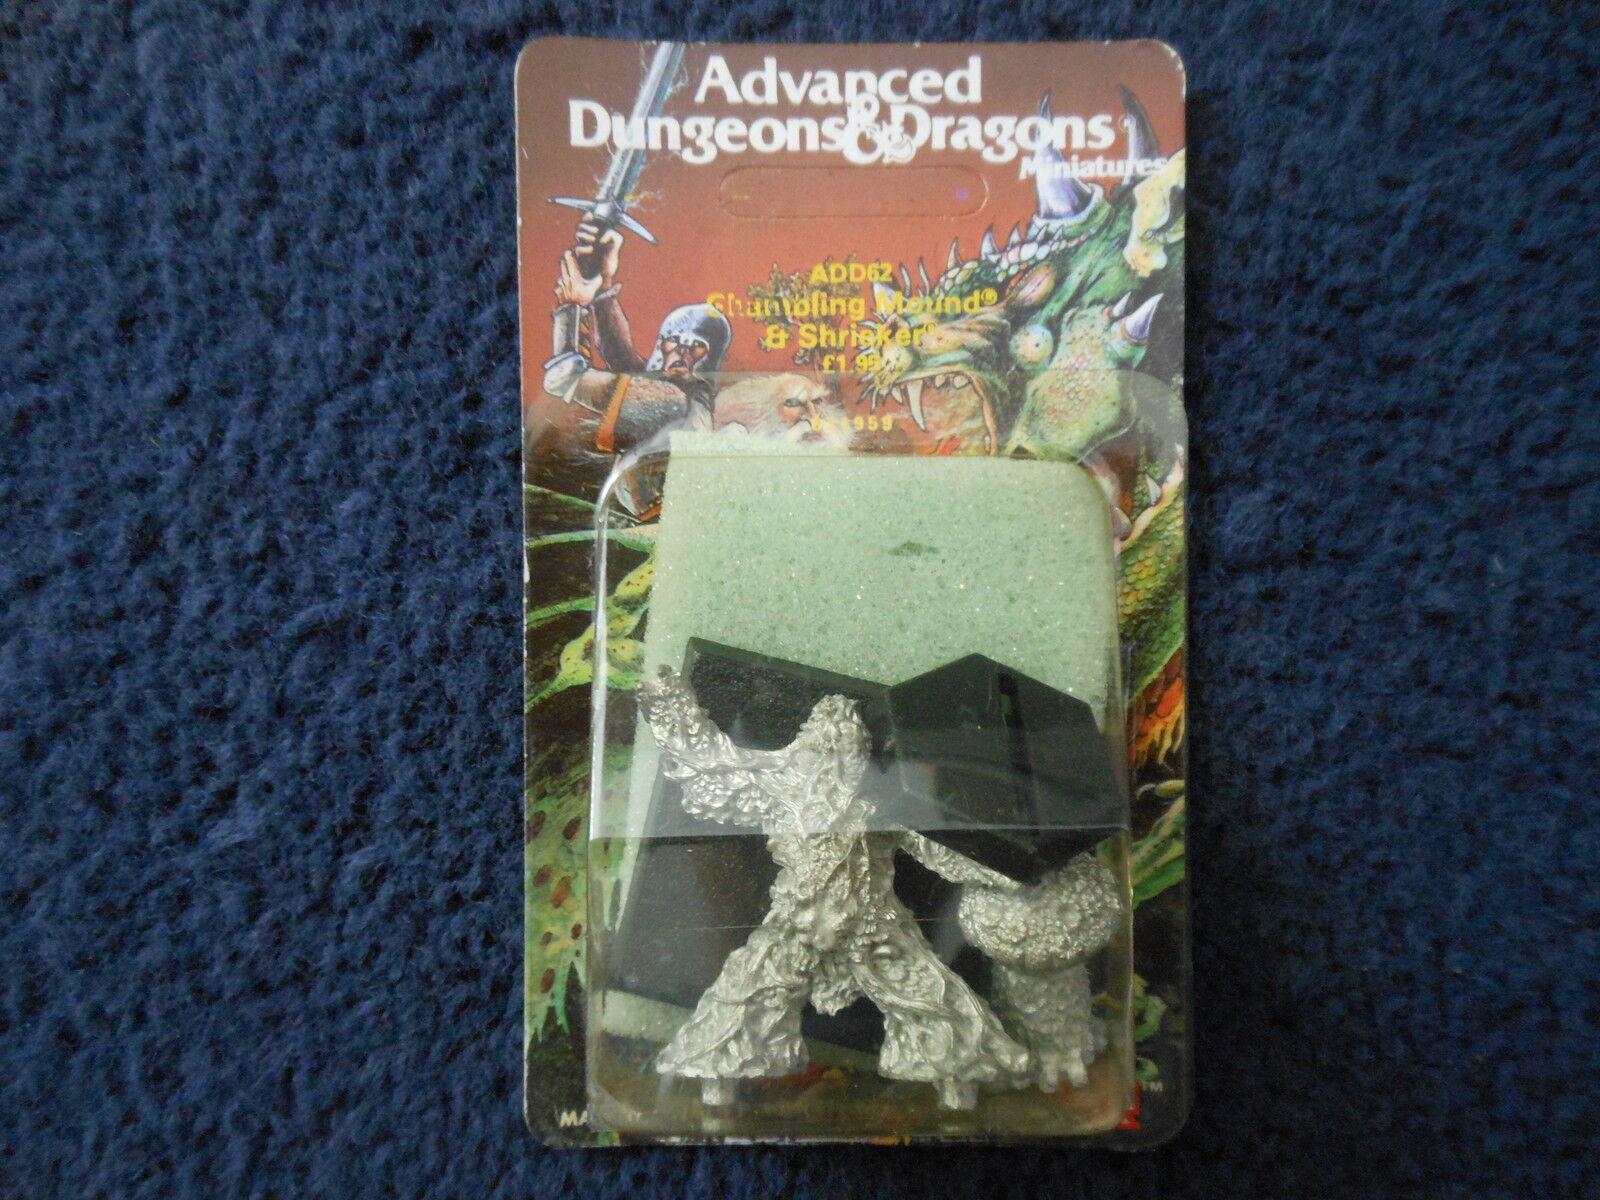 1985 ADD62 comique mound & Shrieker b advanced dungeons & dragons citadel mib